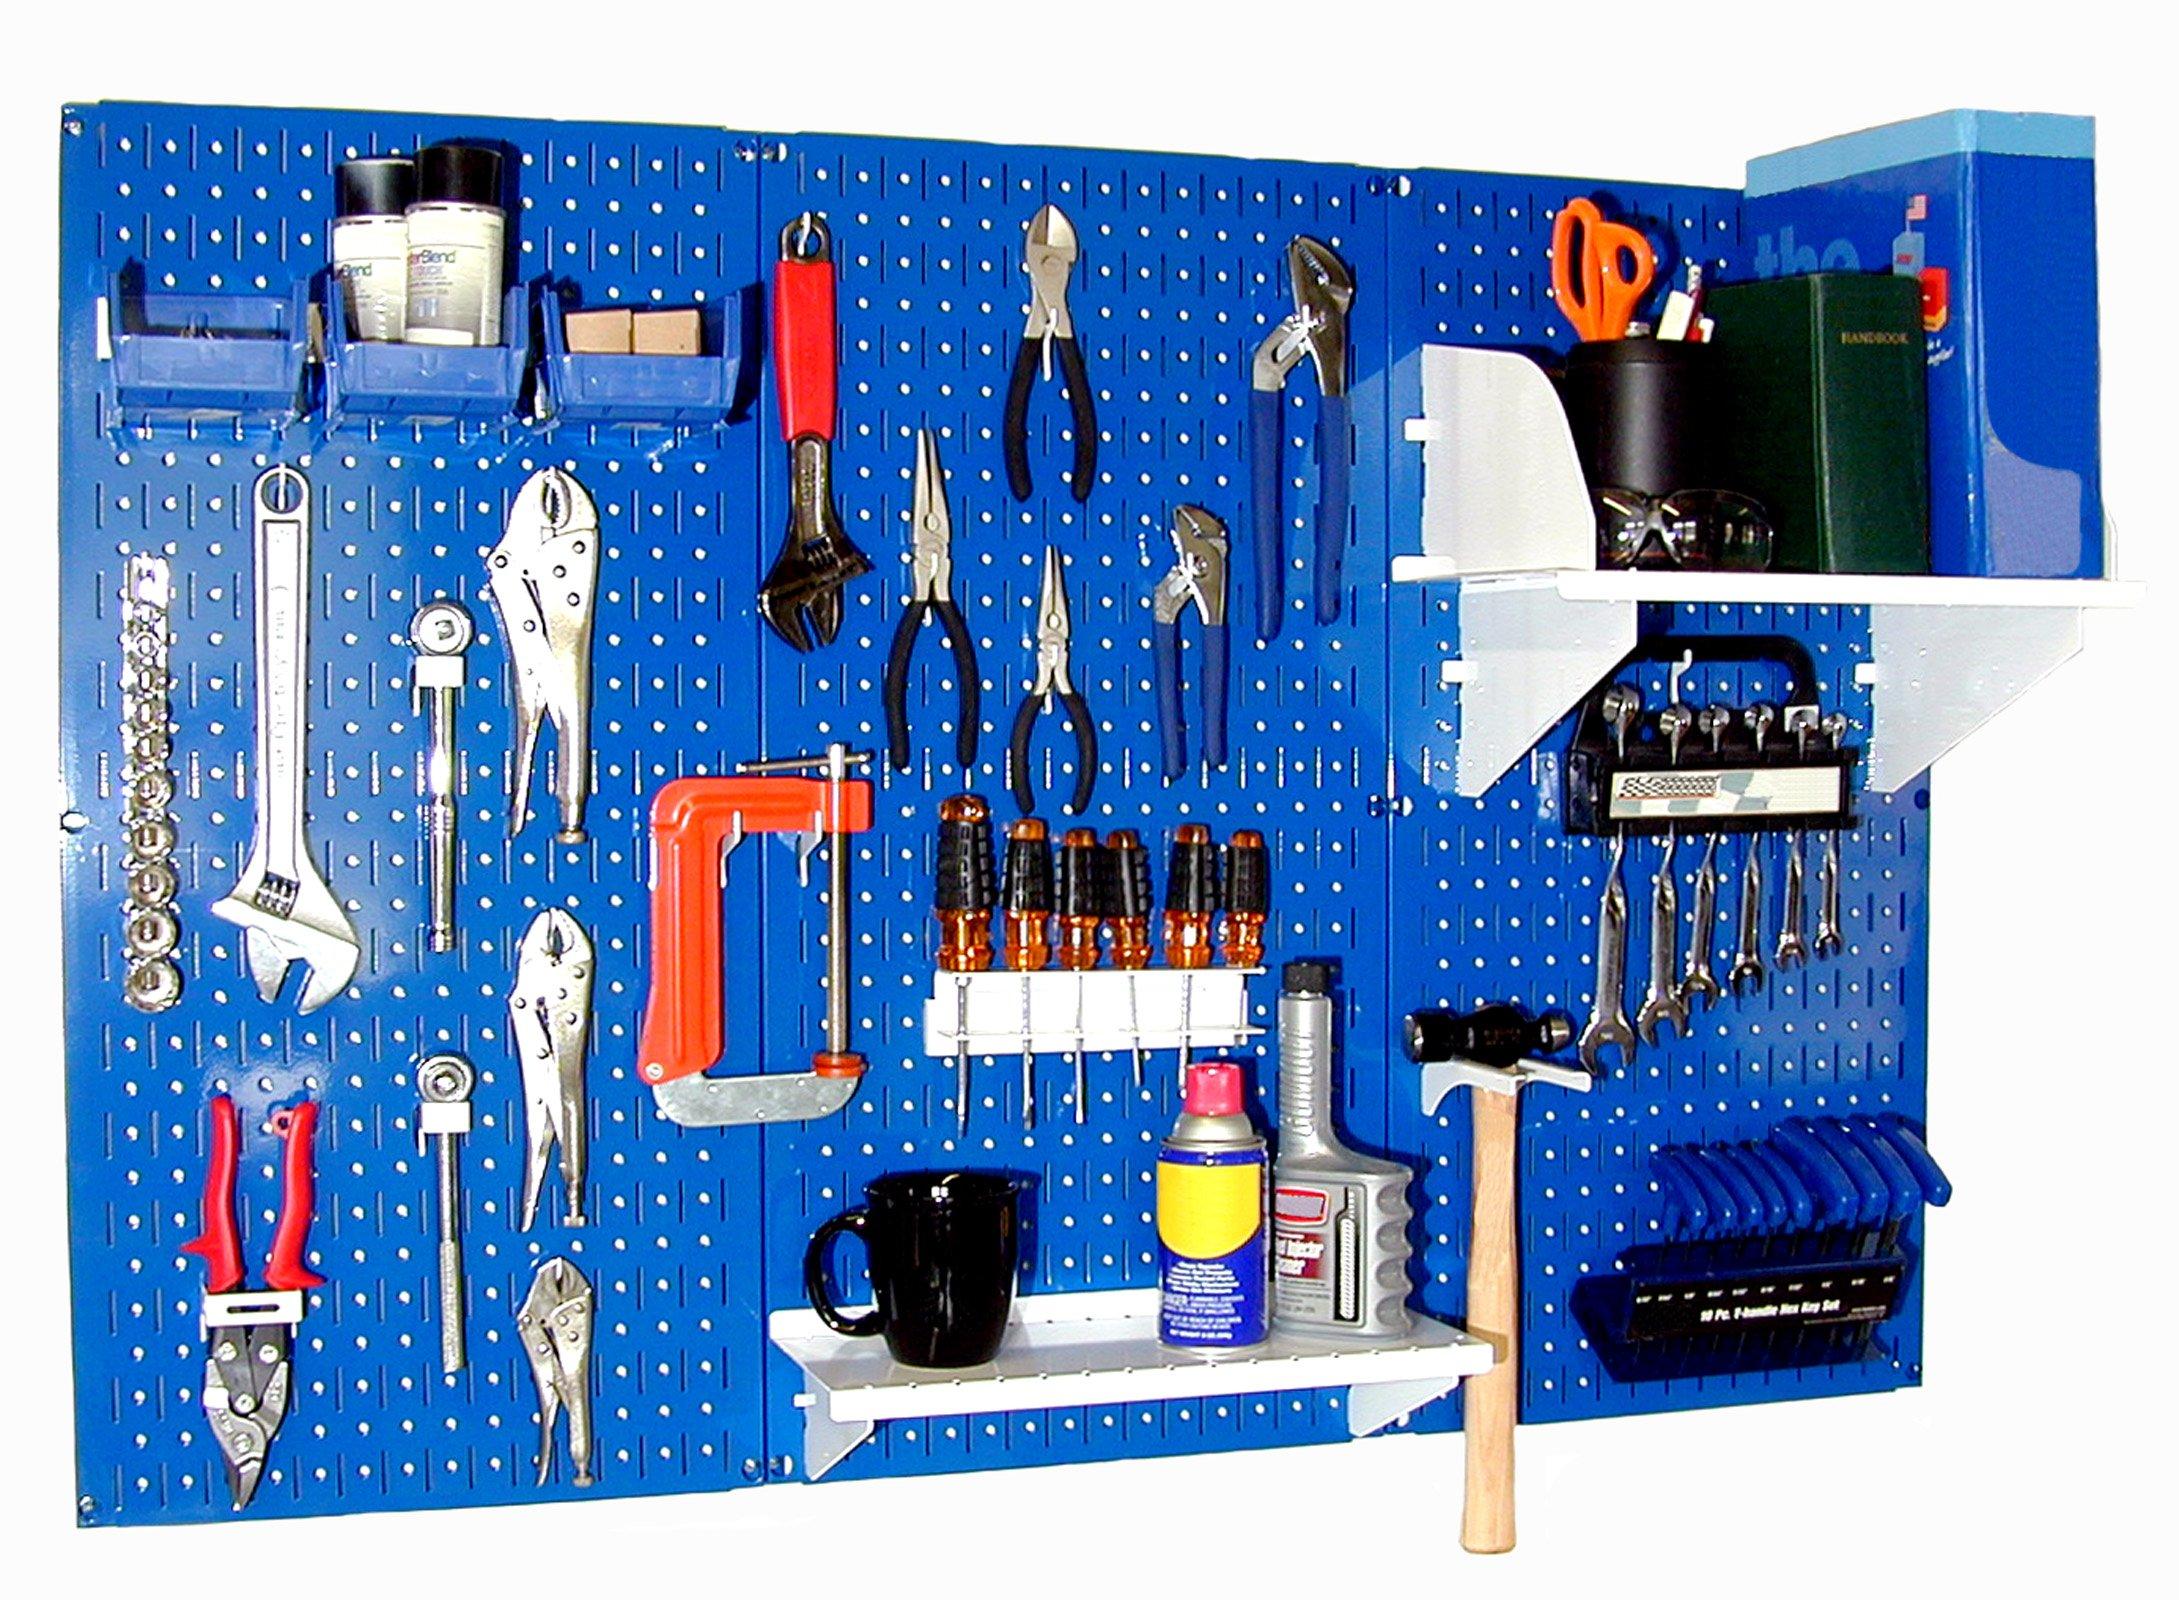 Wall Control 30-WRK-400BUW Standard Workbench Metal Pegboard Tool Organizer